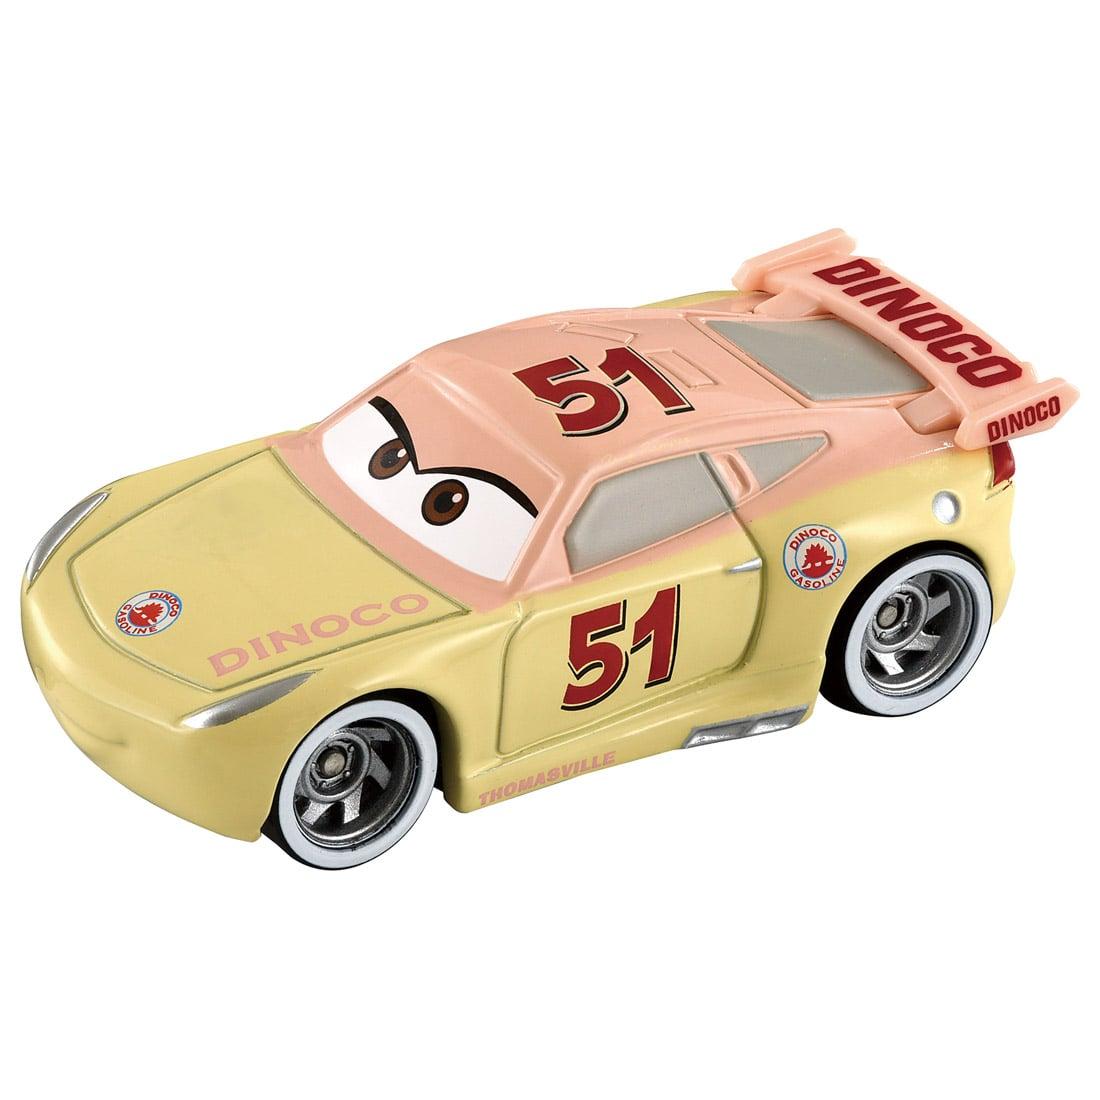 《 TOMICA 多美小汽車》CARS C-49克魯茲.拉米雷斯 東喬精品百貨